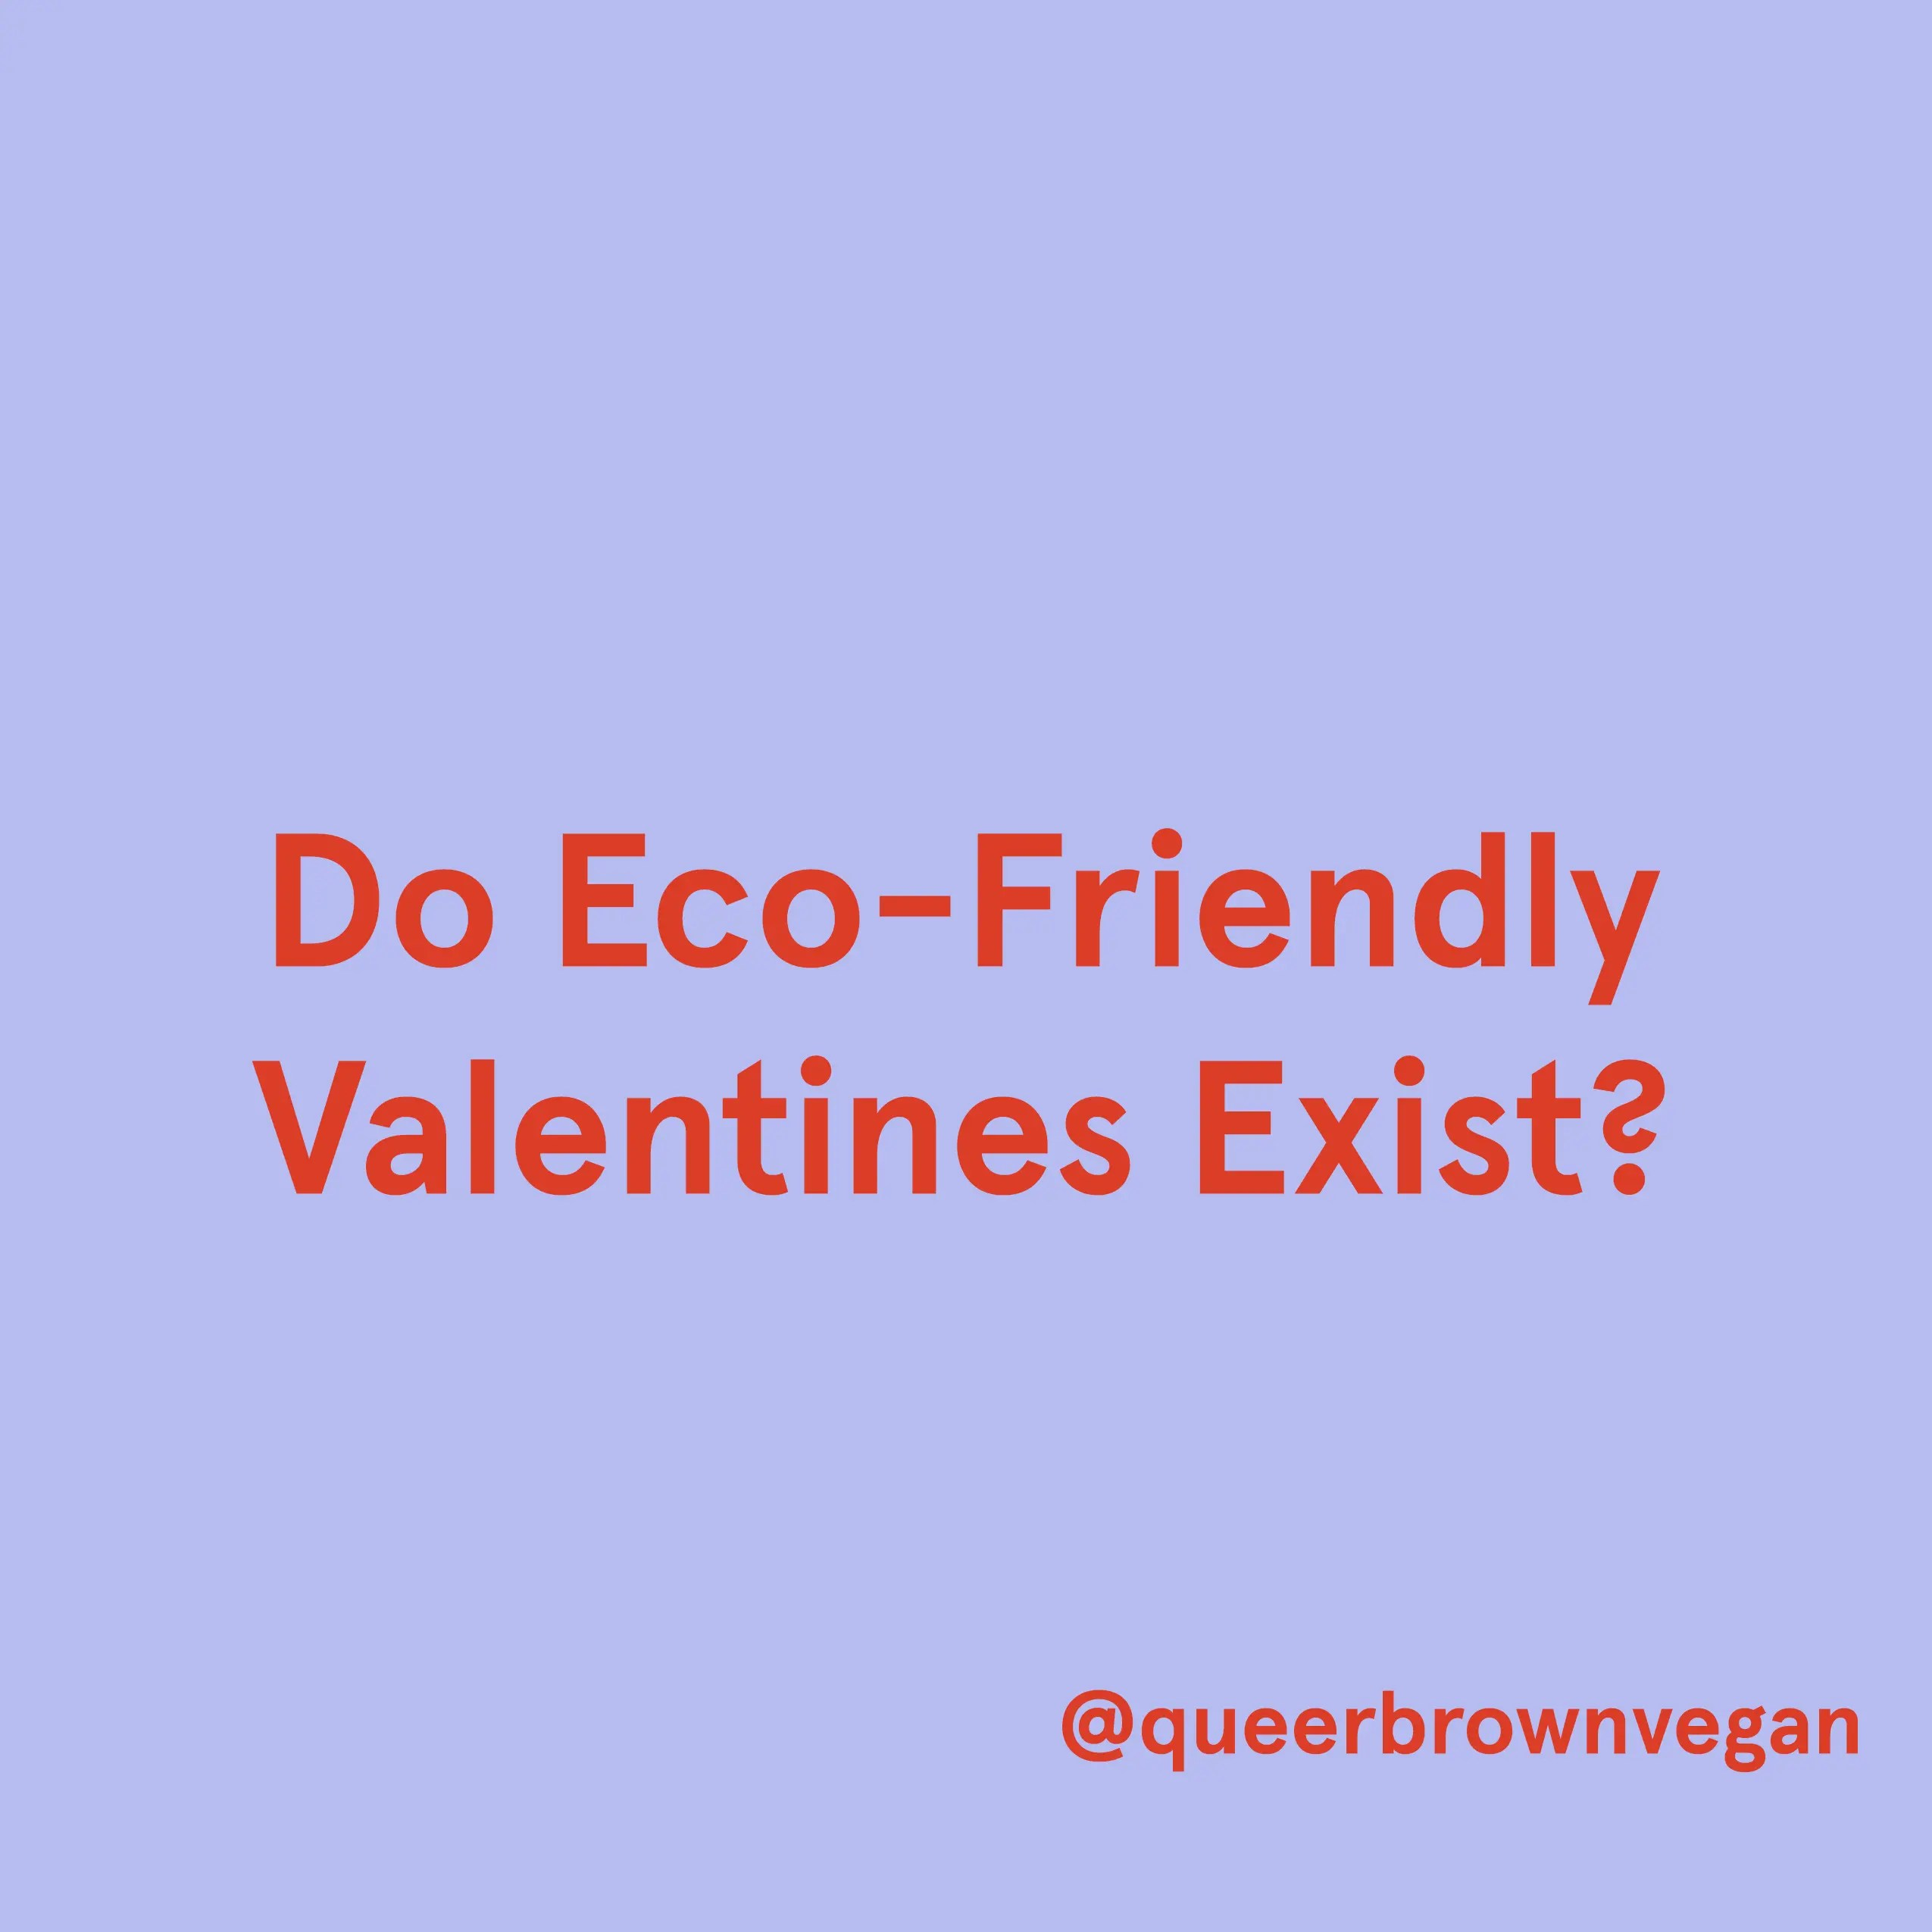 Do Eco-Friendly Valentine's Exist?